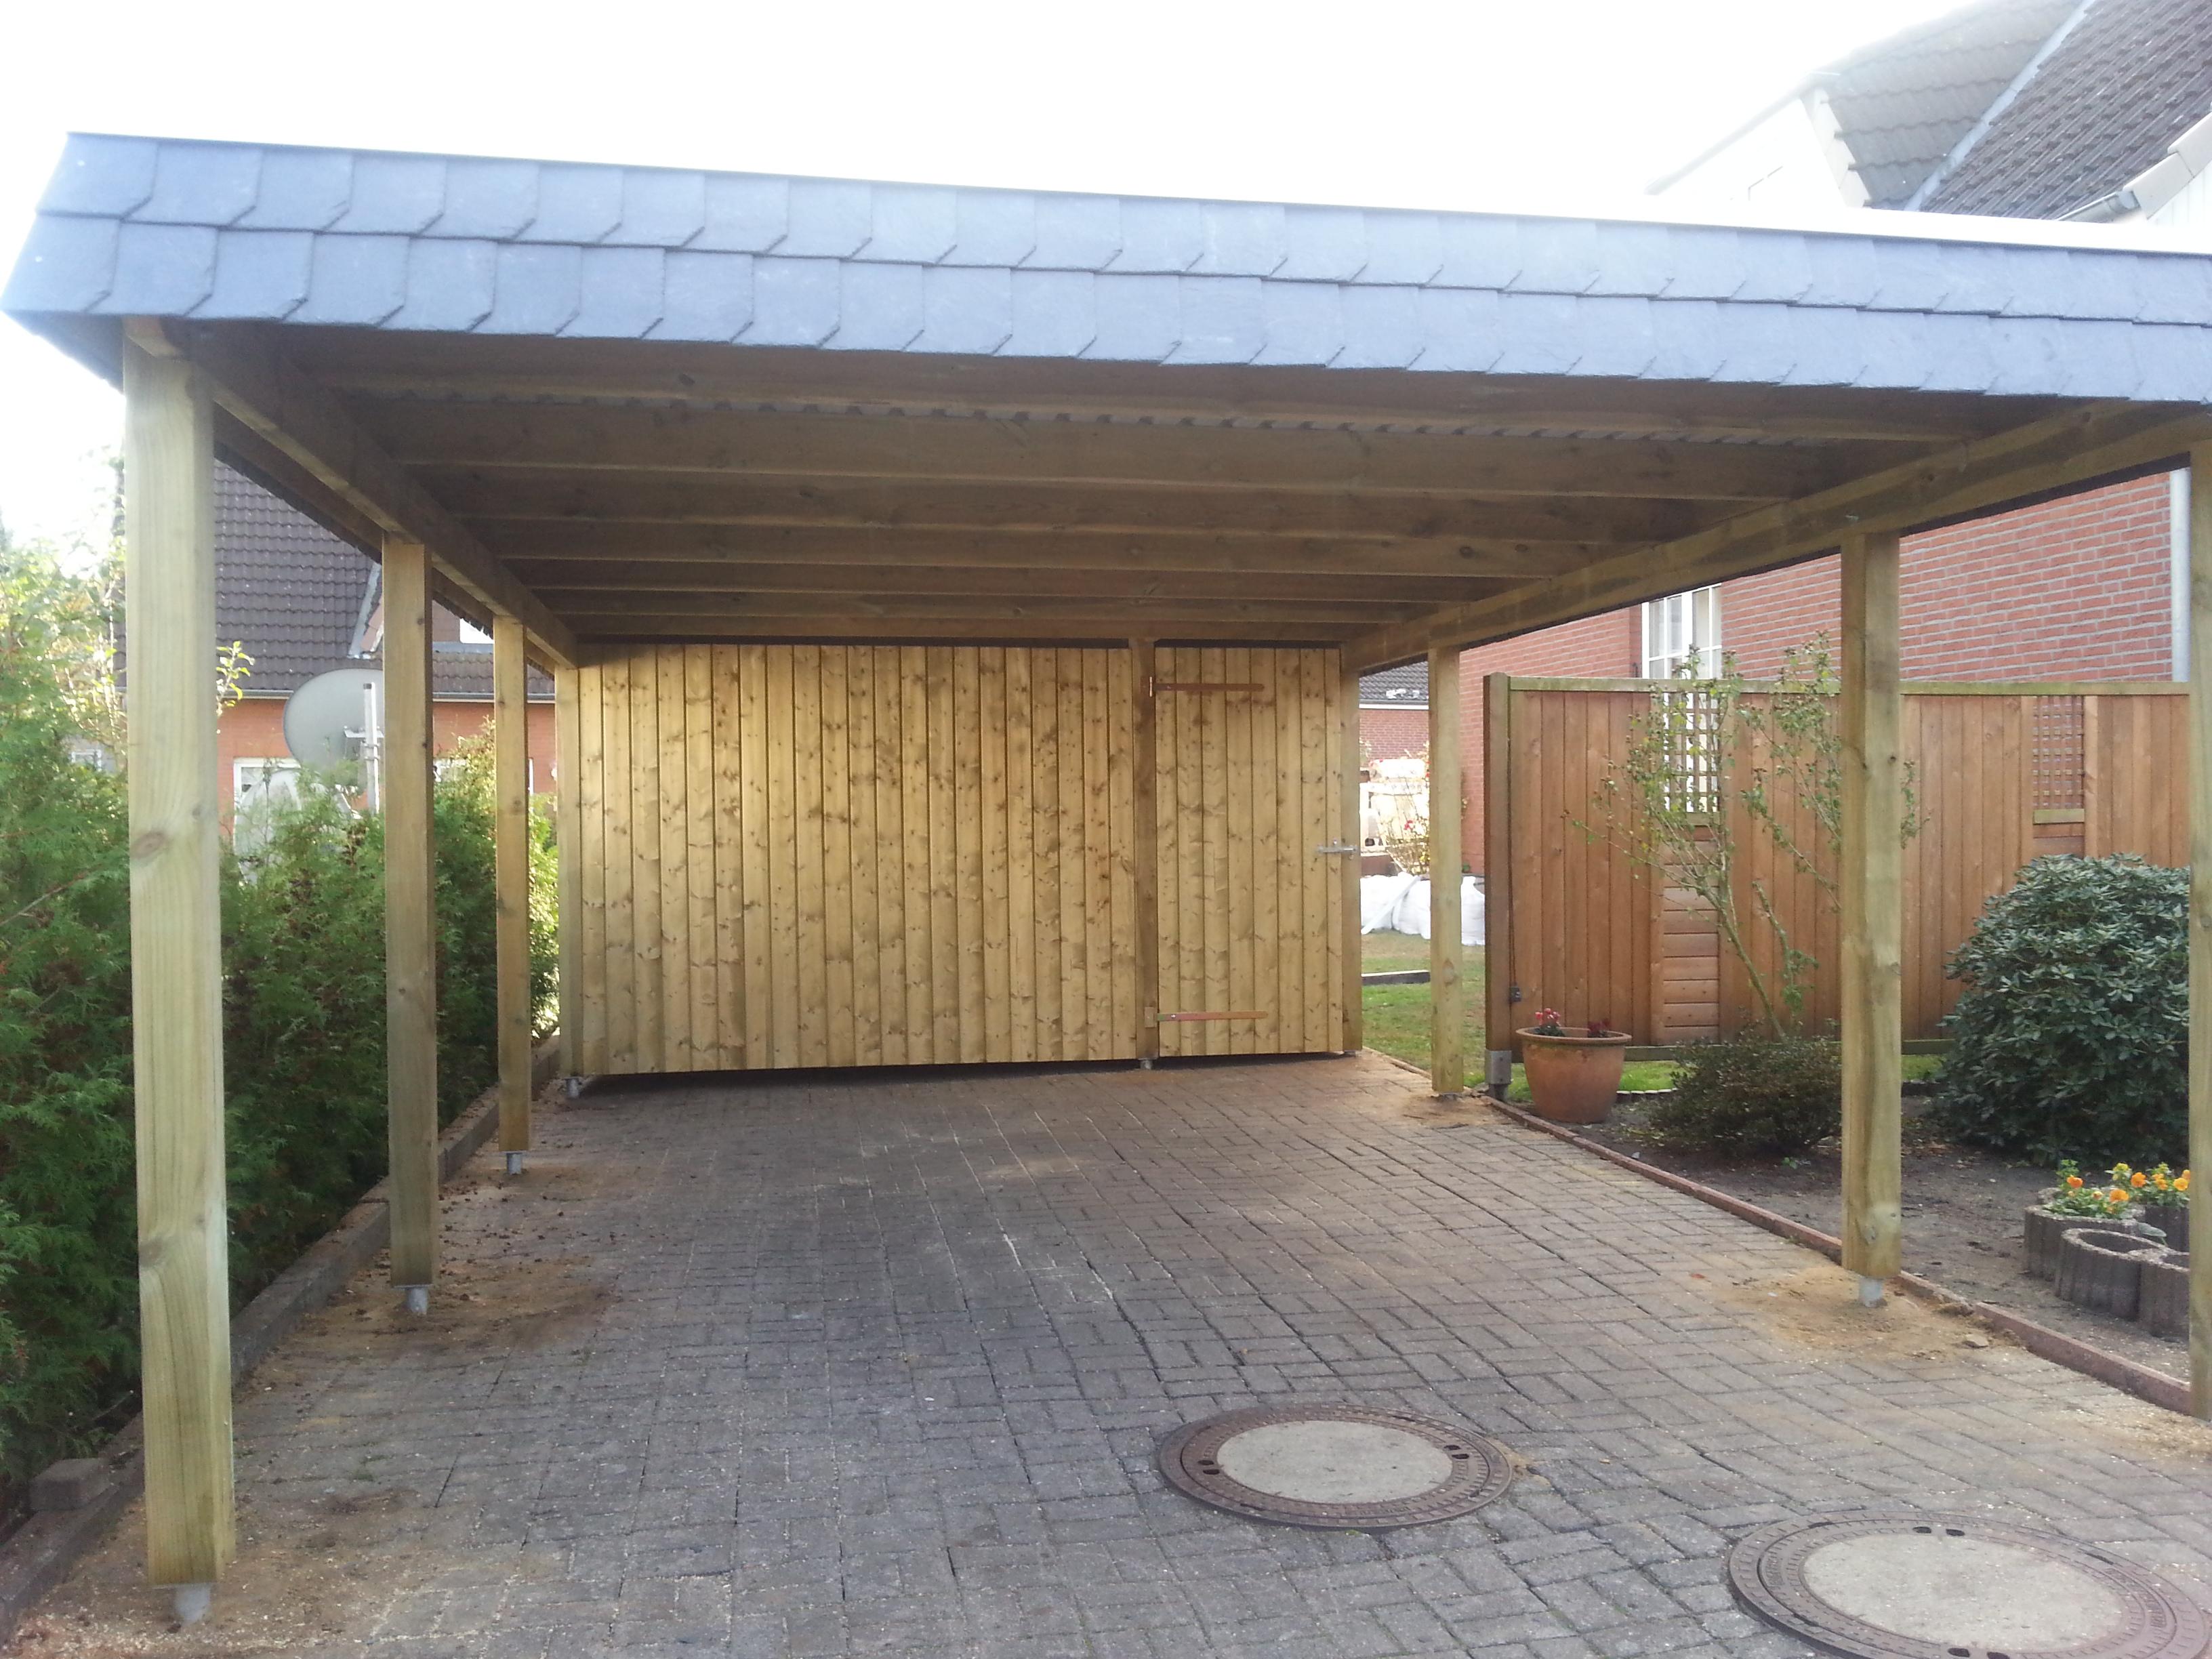 galerie carport carport nord carport hamburg terrassendach hamburg vordach hamburg. Black Bedroom Furniture Sets. Home Design Ideas